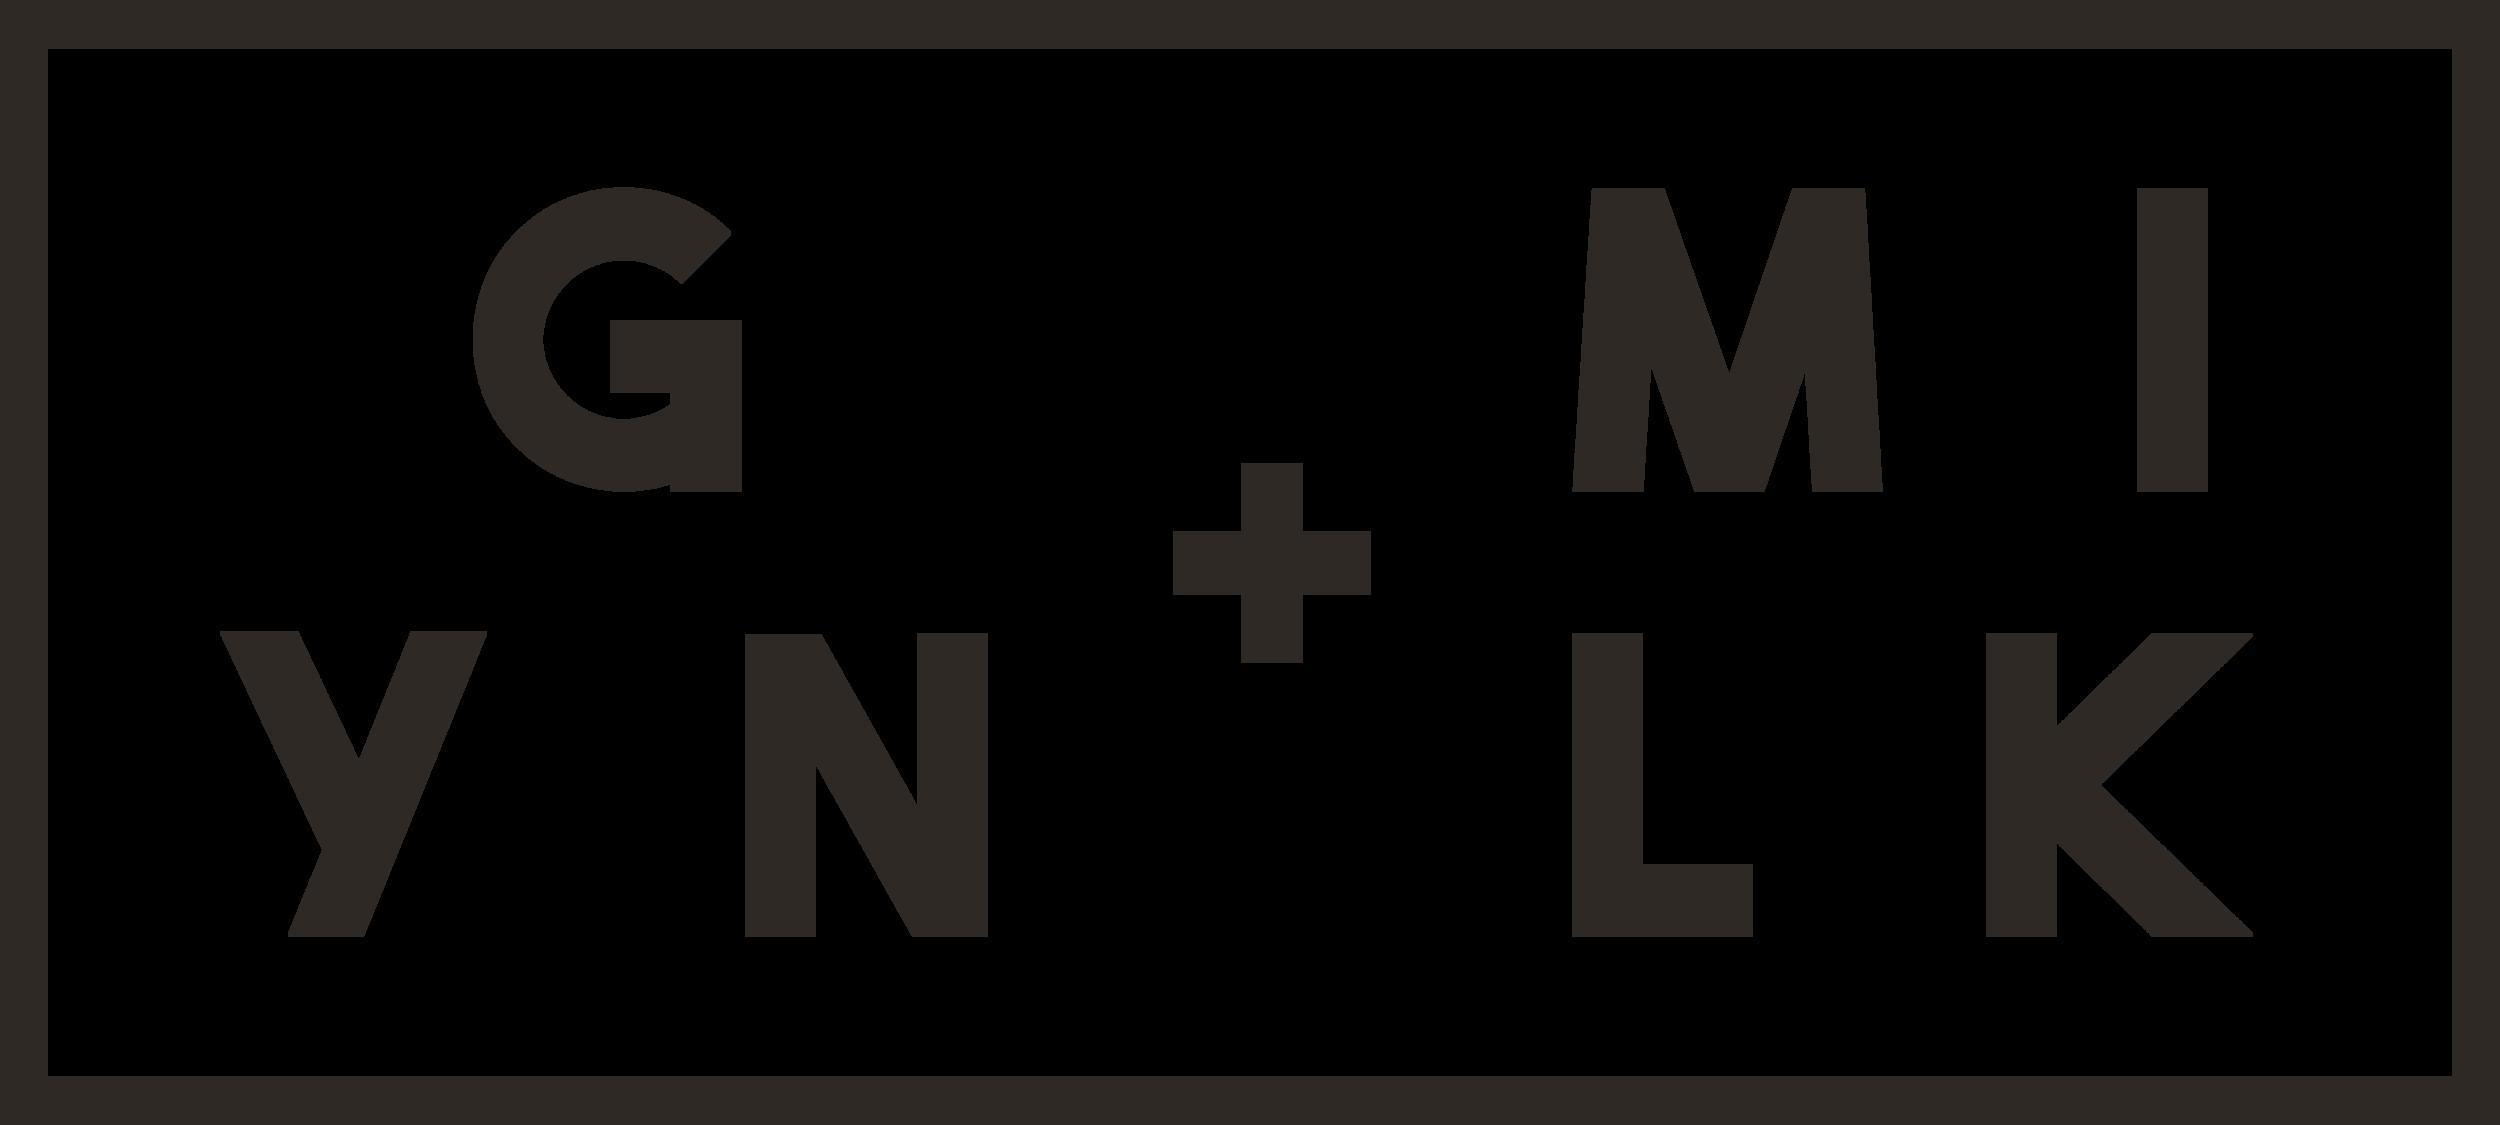 G+M VINIL 580x261mm_preto.png